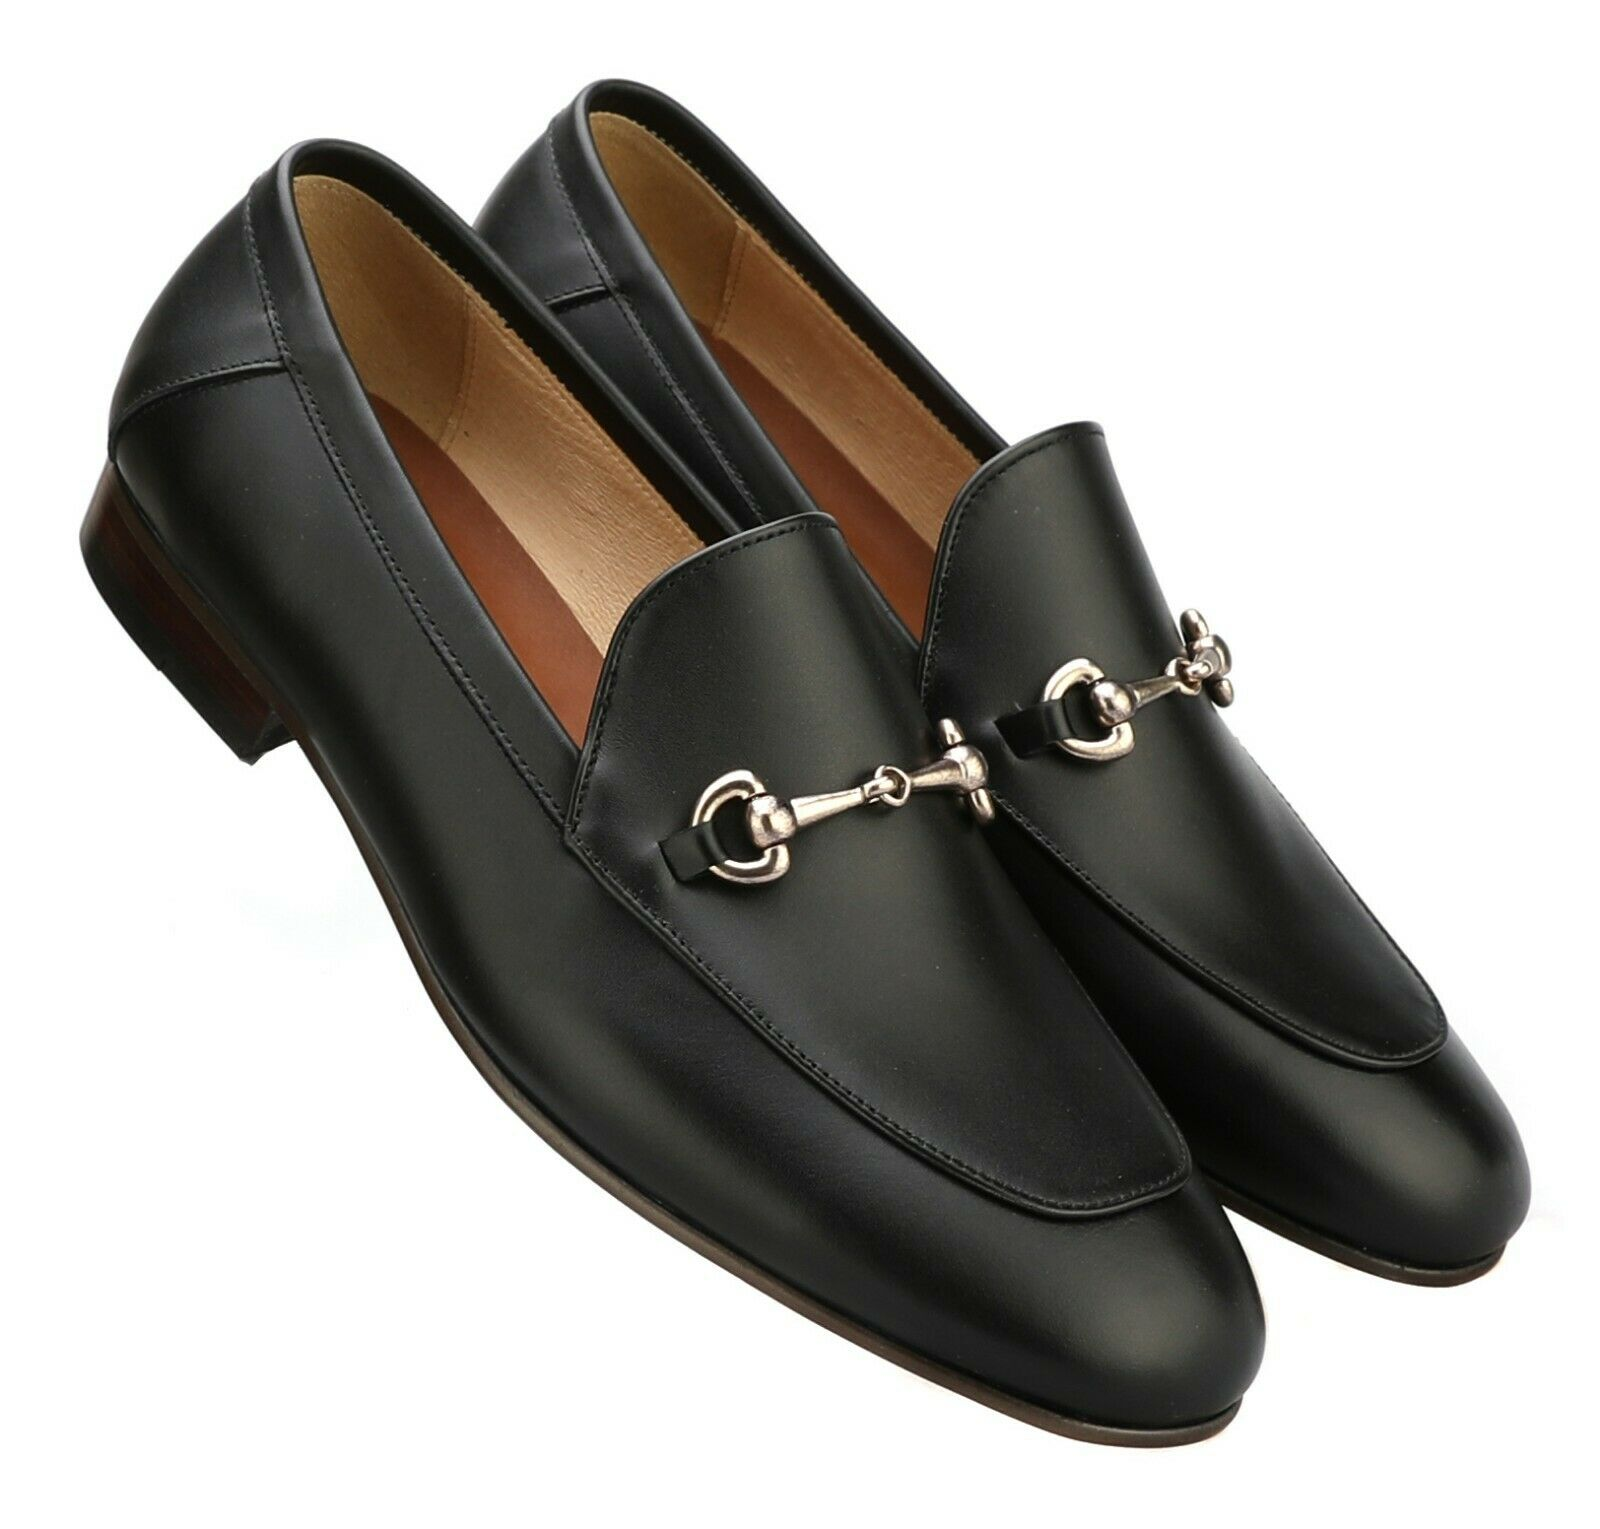 Firenze Atelier Men's Handmade BLACK Leather Horse Bit Loafers  Penny Loafers